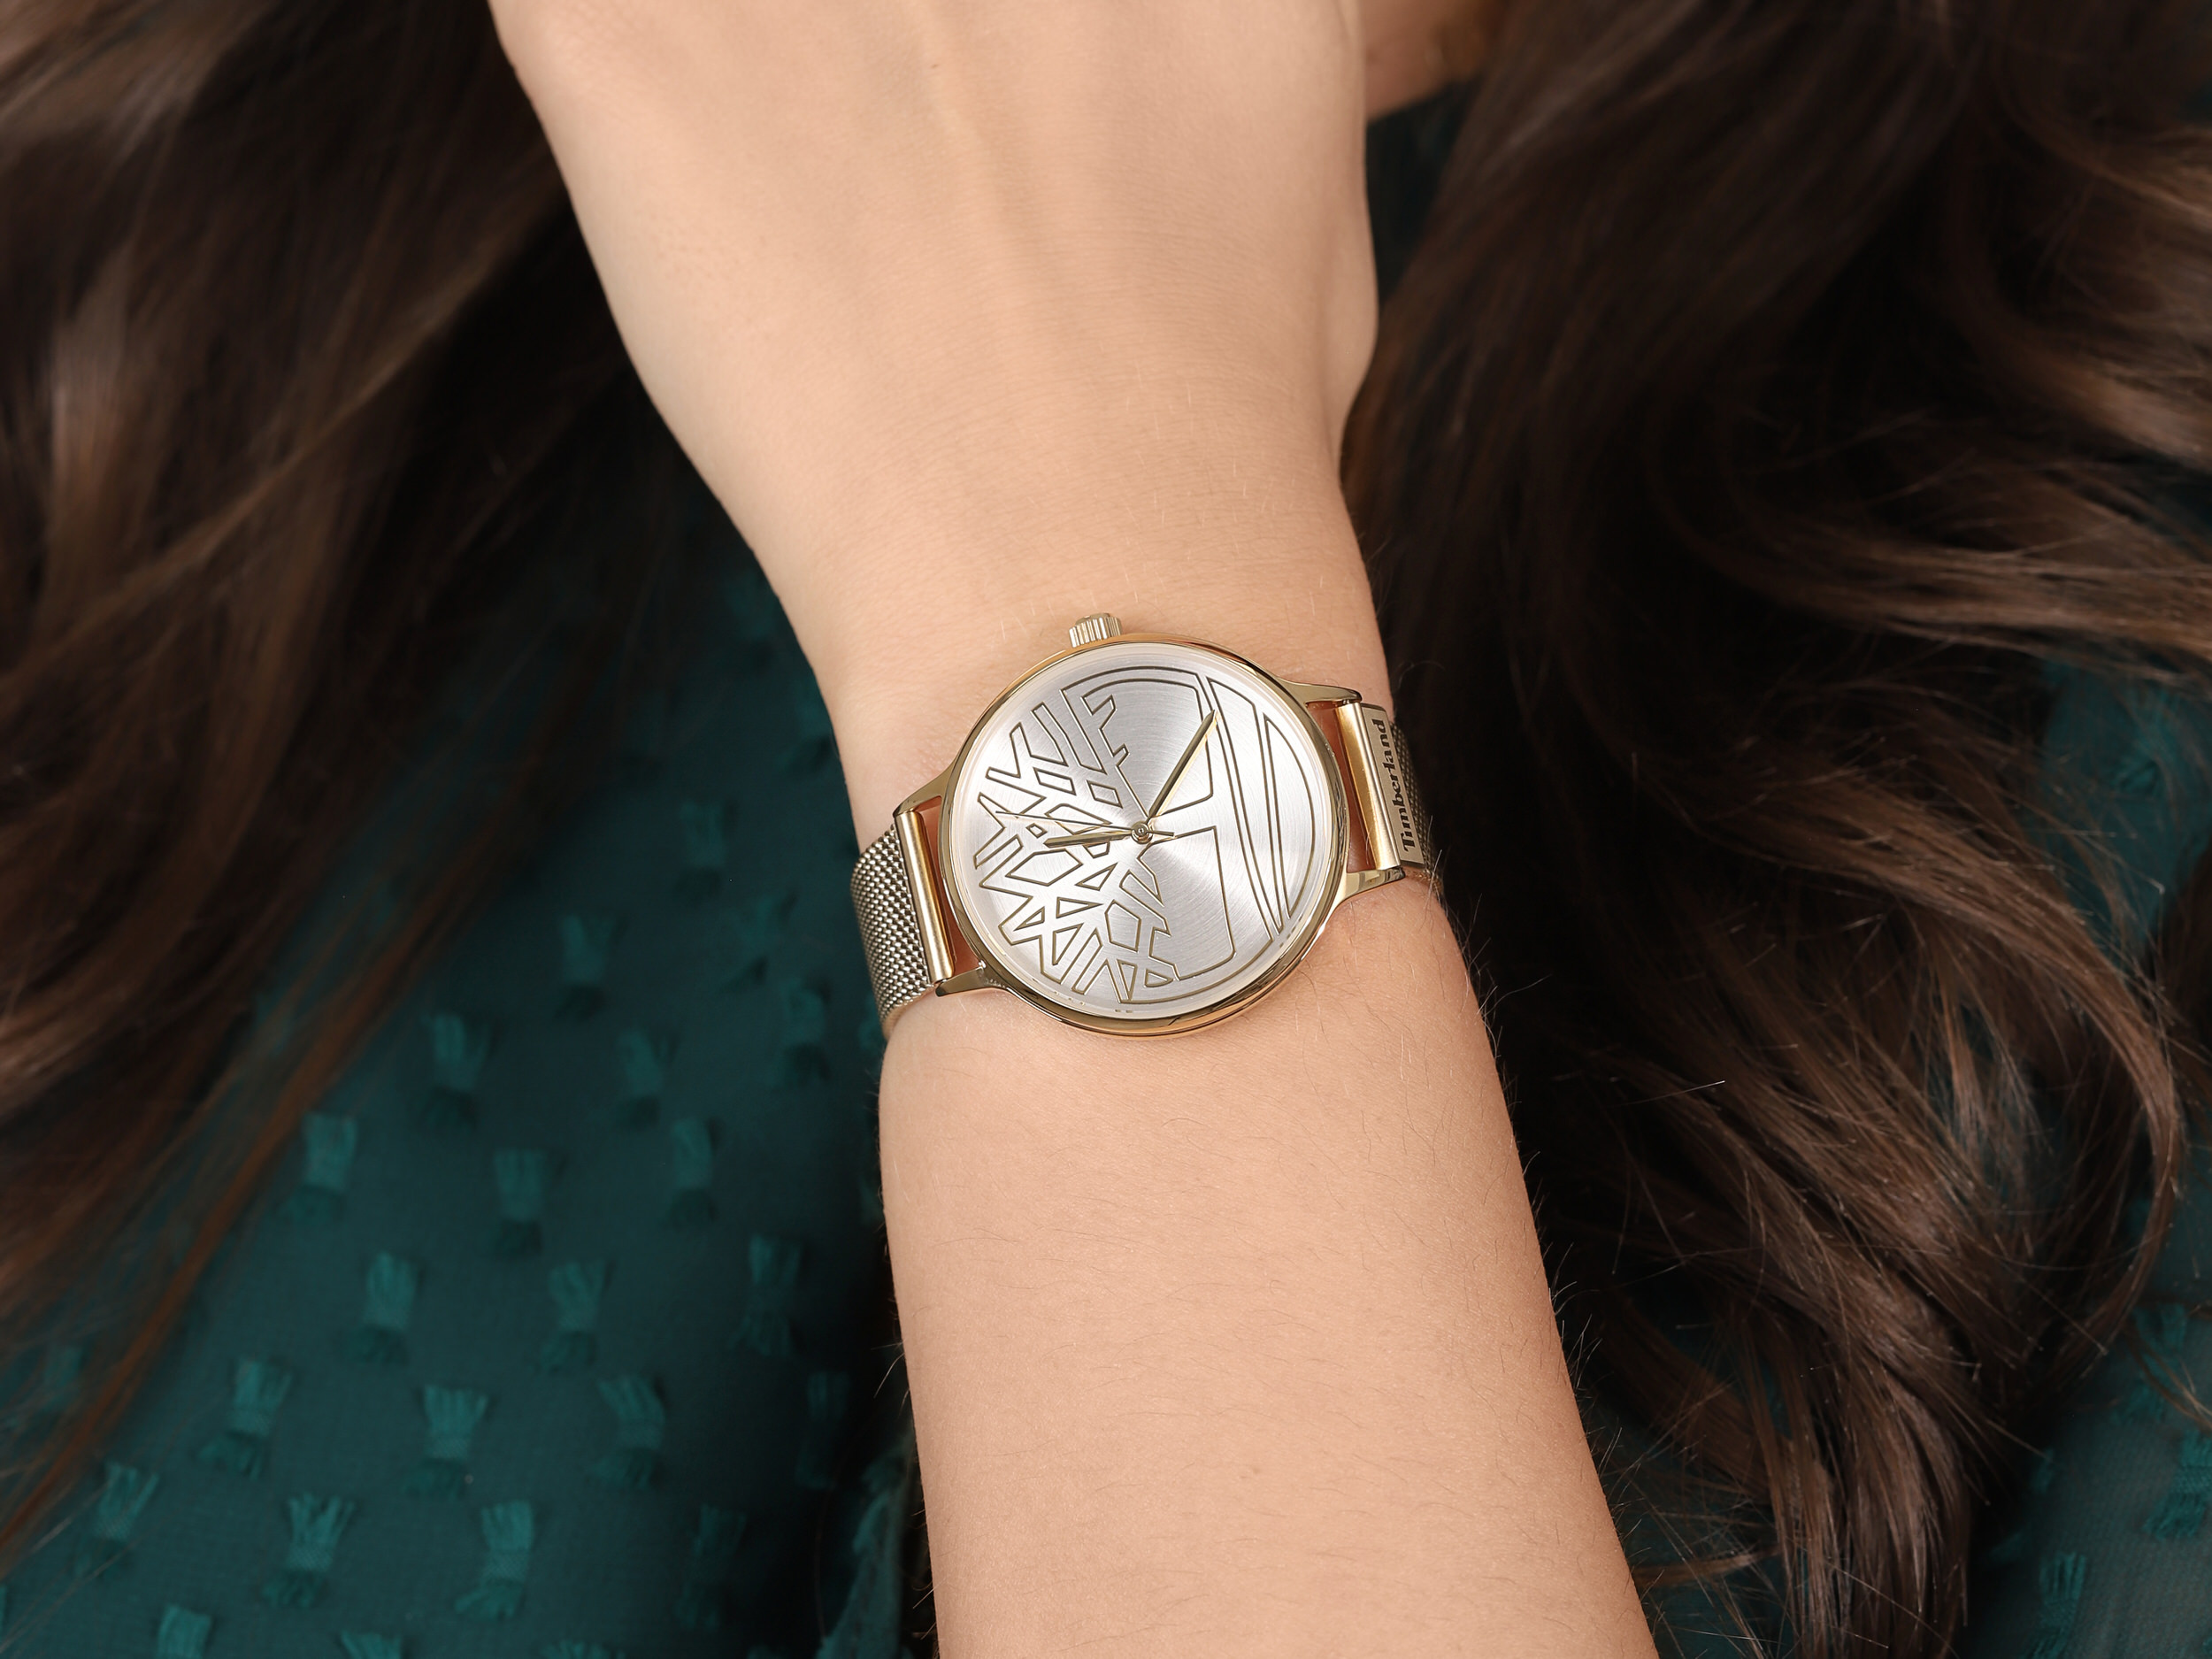 Timberland TBL.15644MYG-04MM damski zegarek Tyringham bransoleta